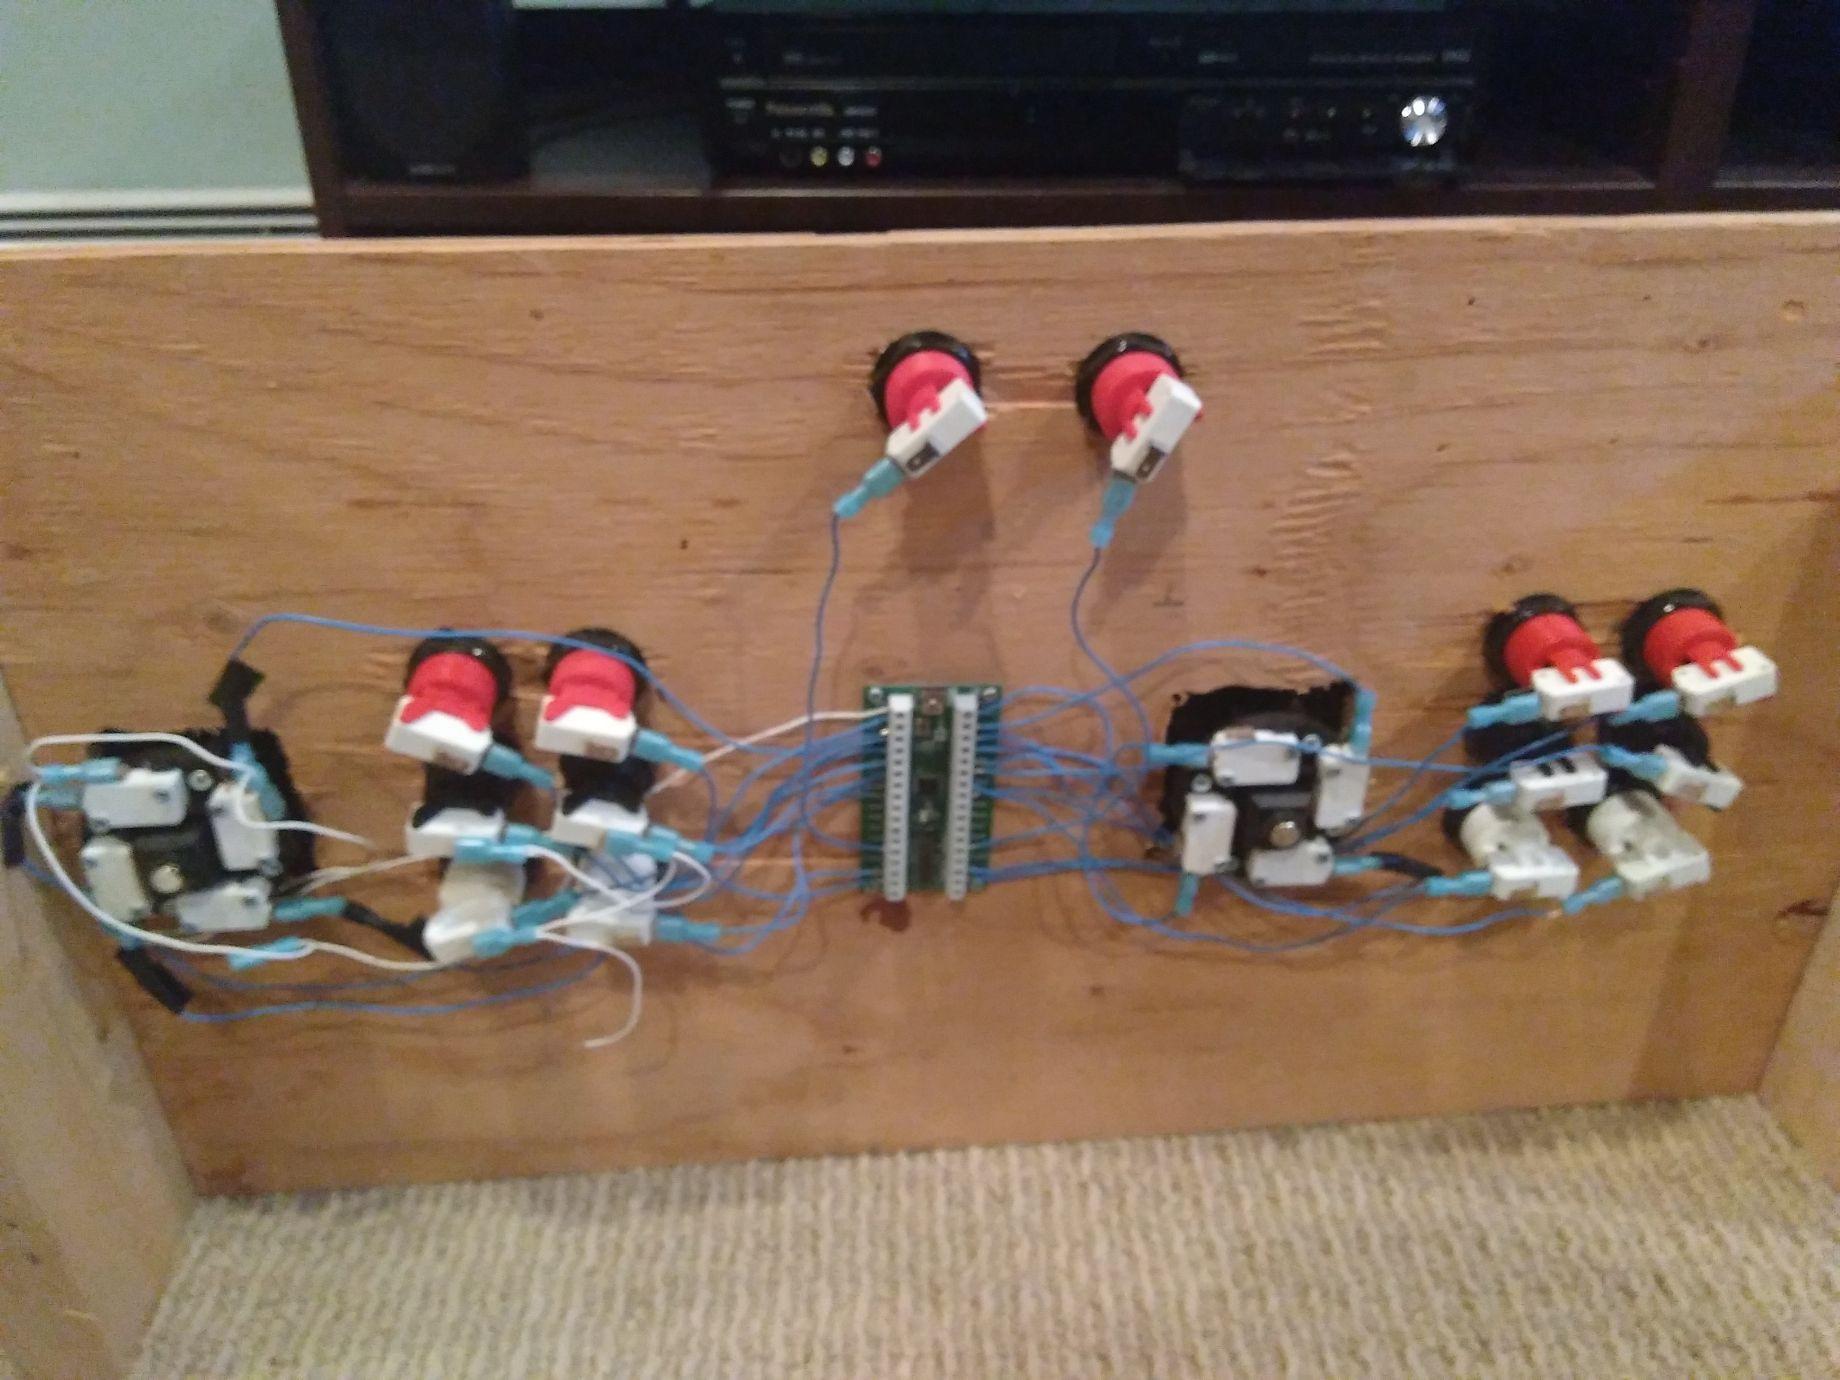 Arcade Controller rewire